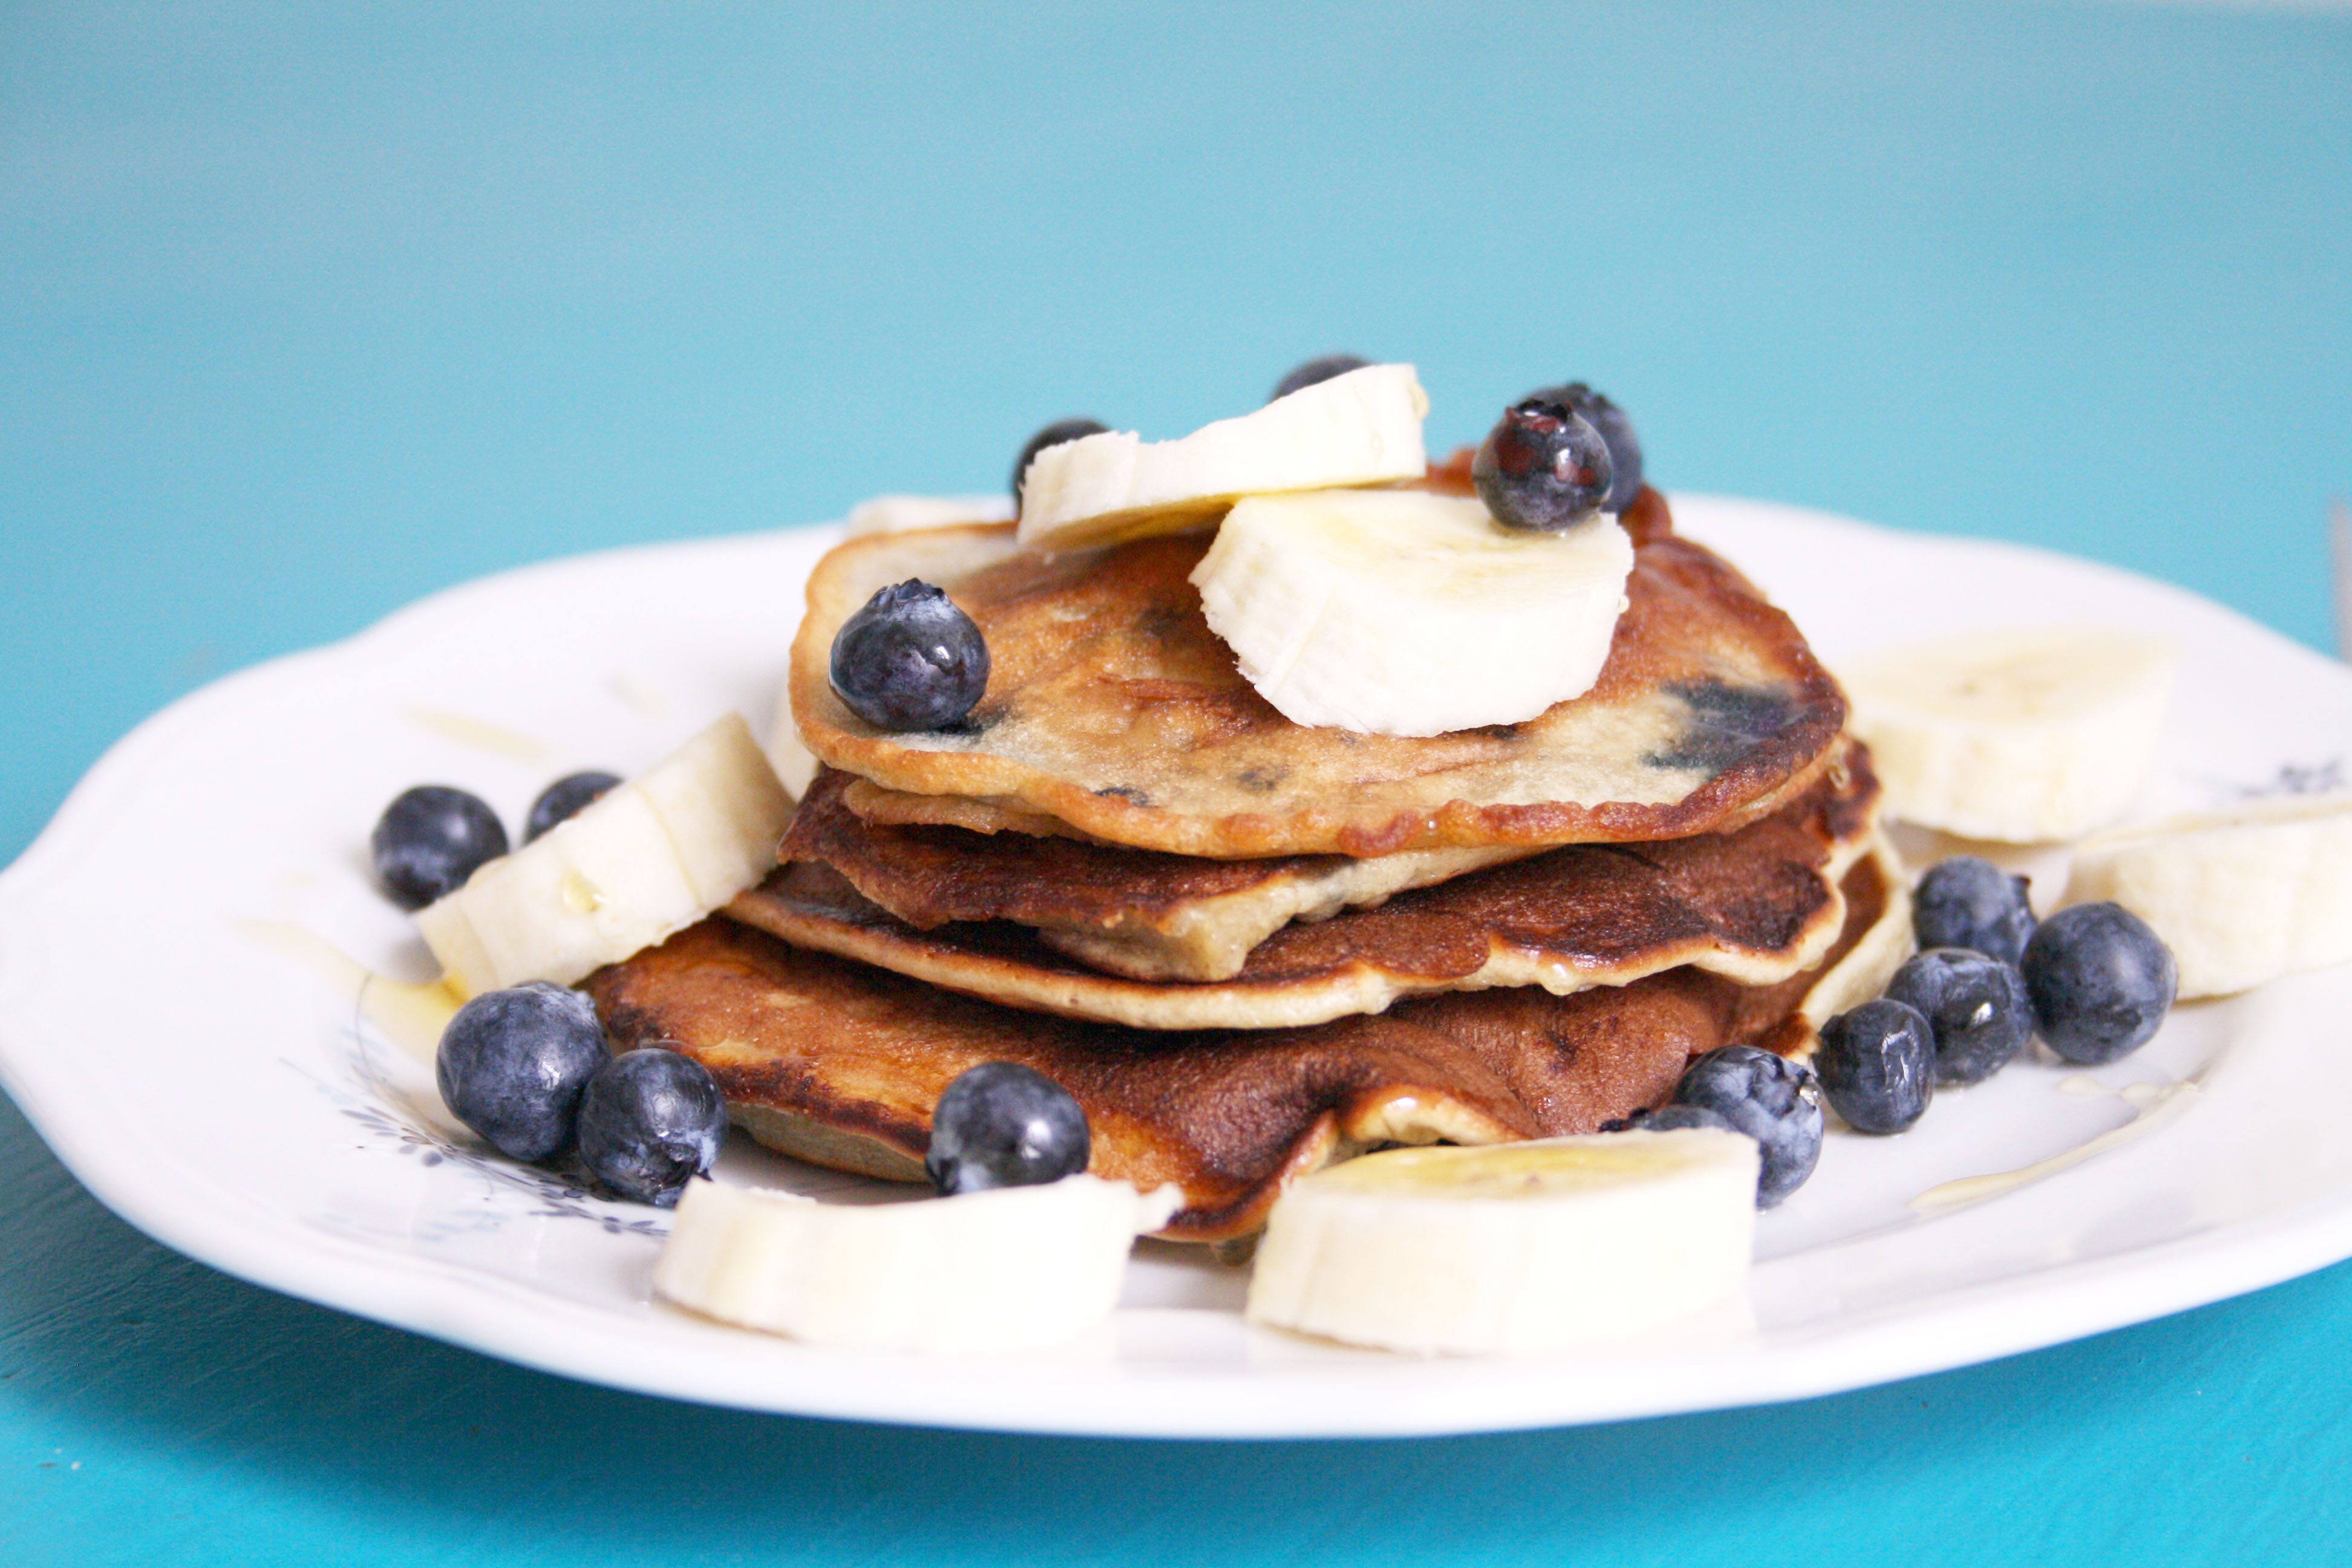 Recipe: Blueberry-Banana Pancakes